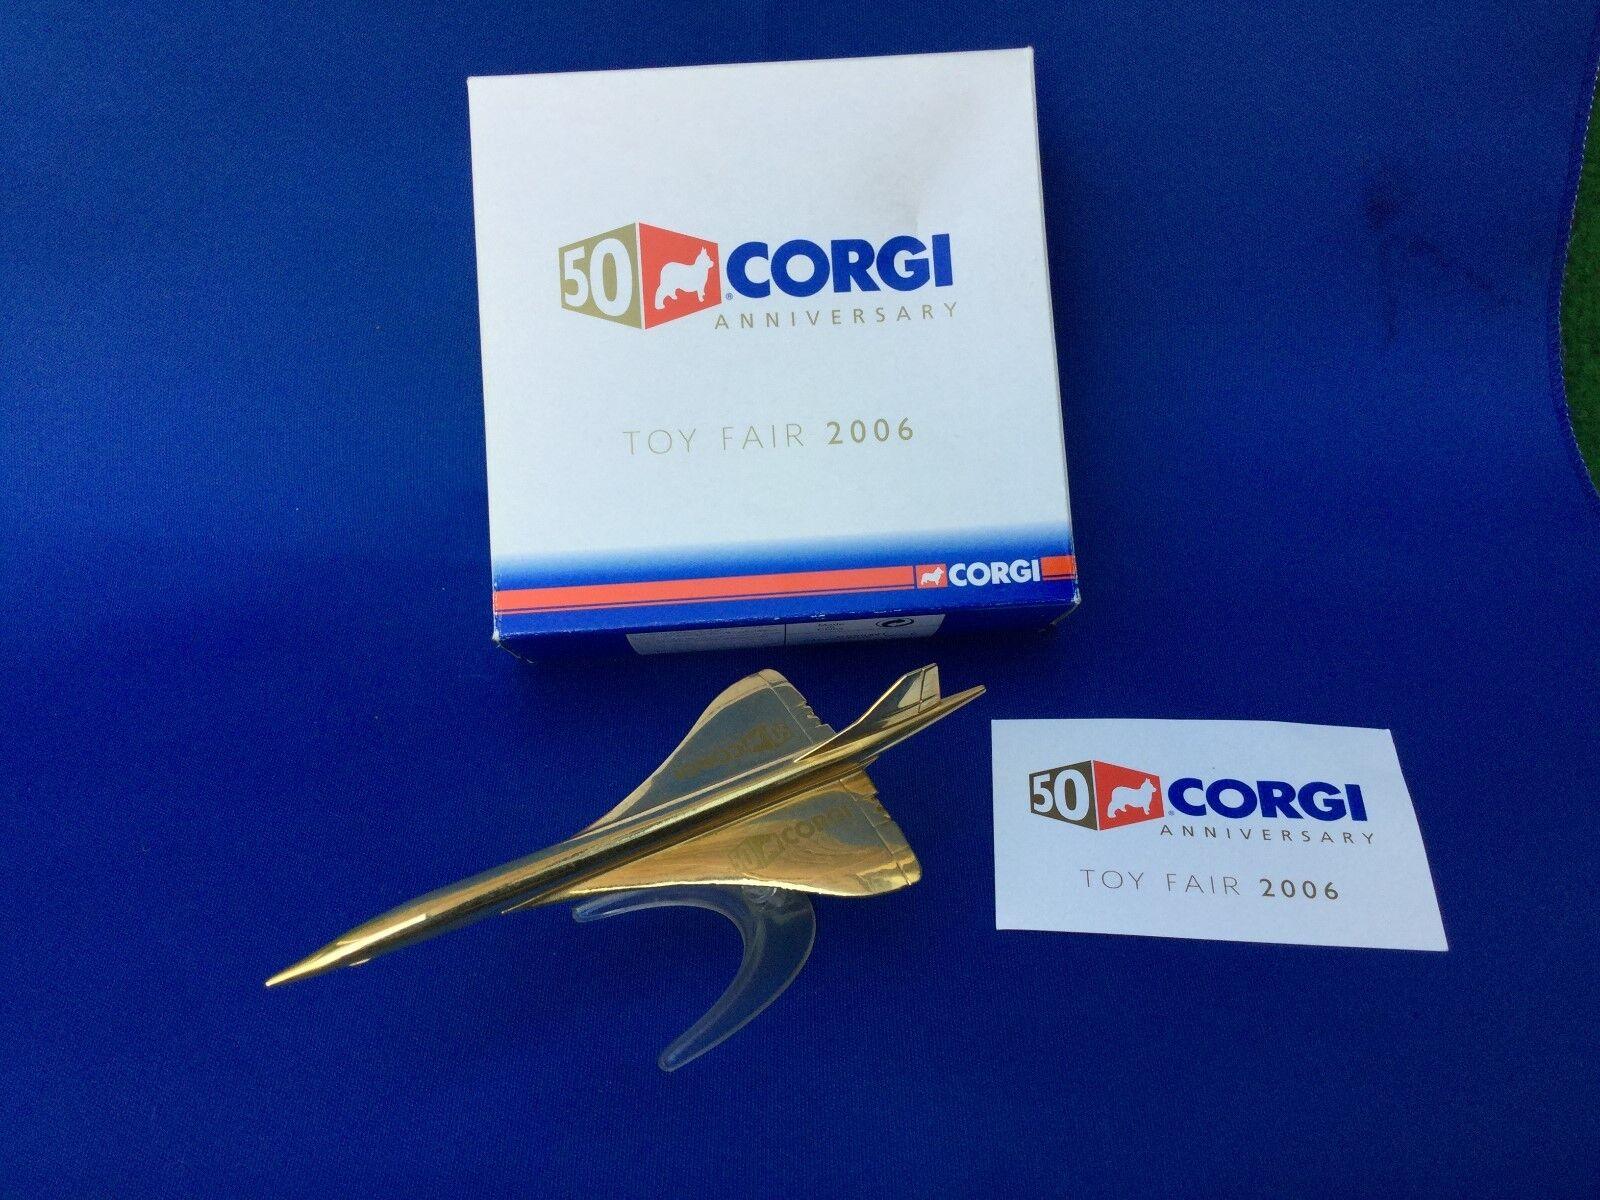 Corgi concorde Gold toy fair 2006 stillgelegt